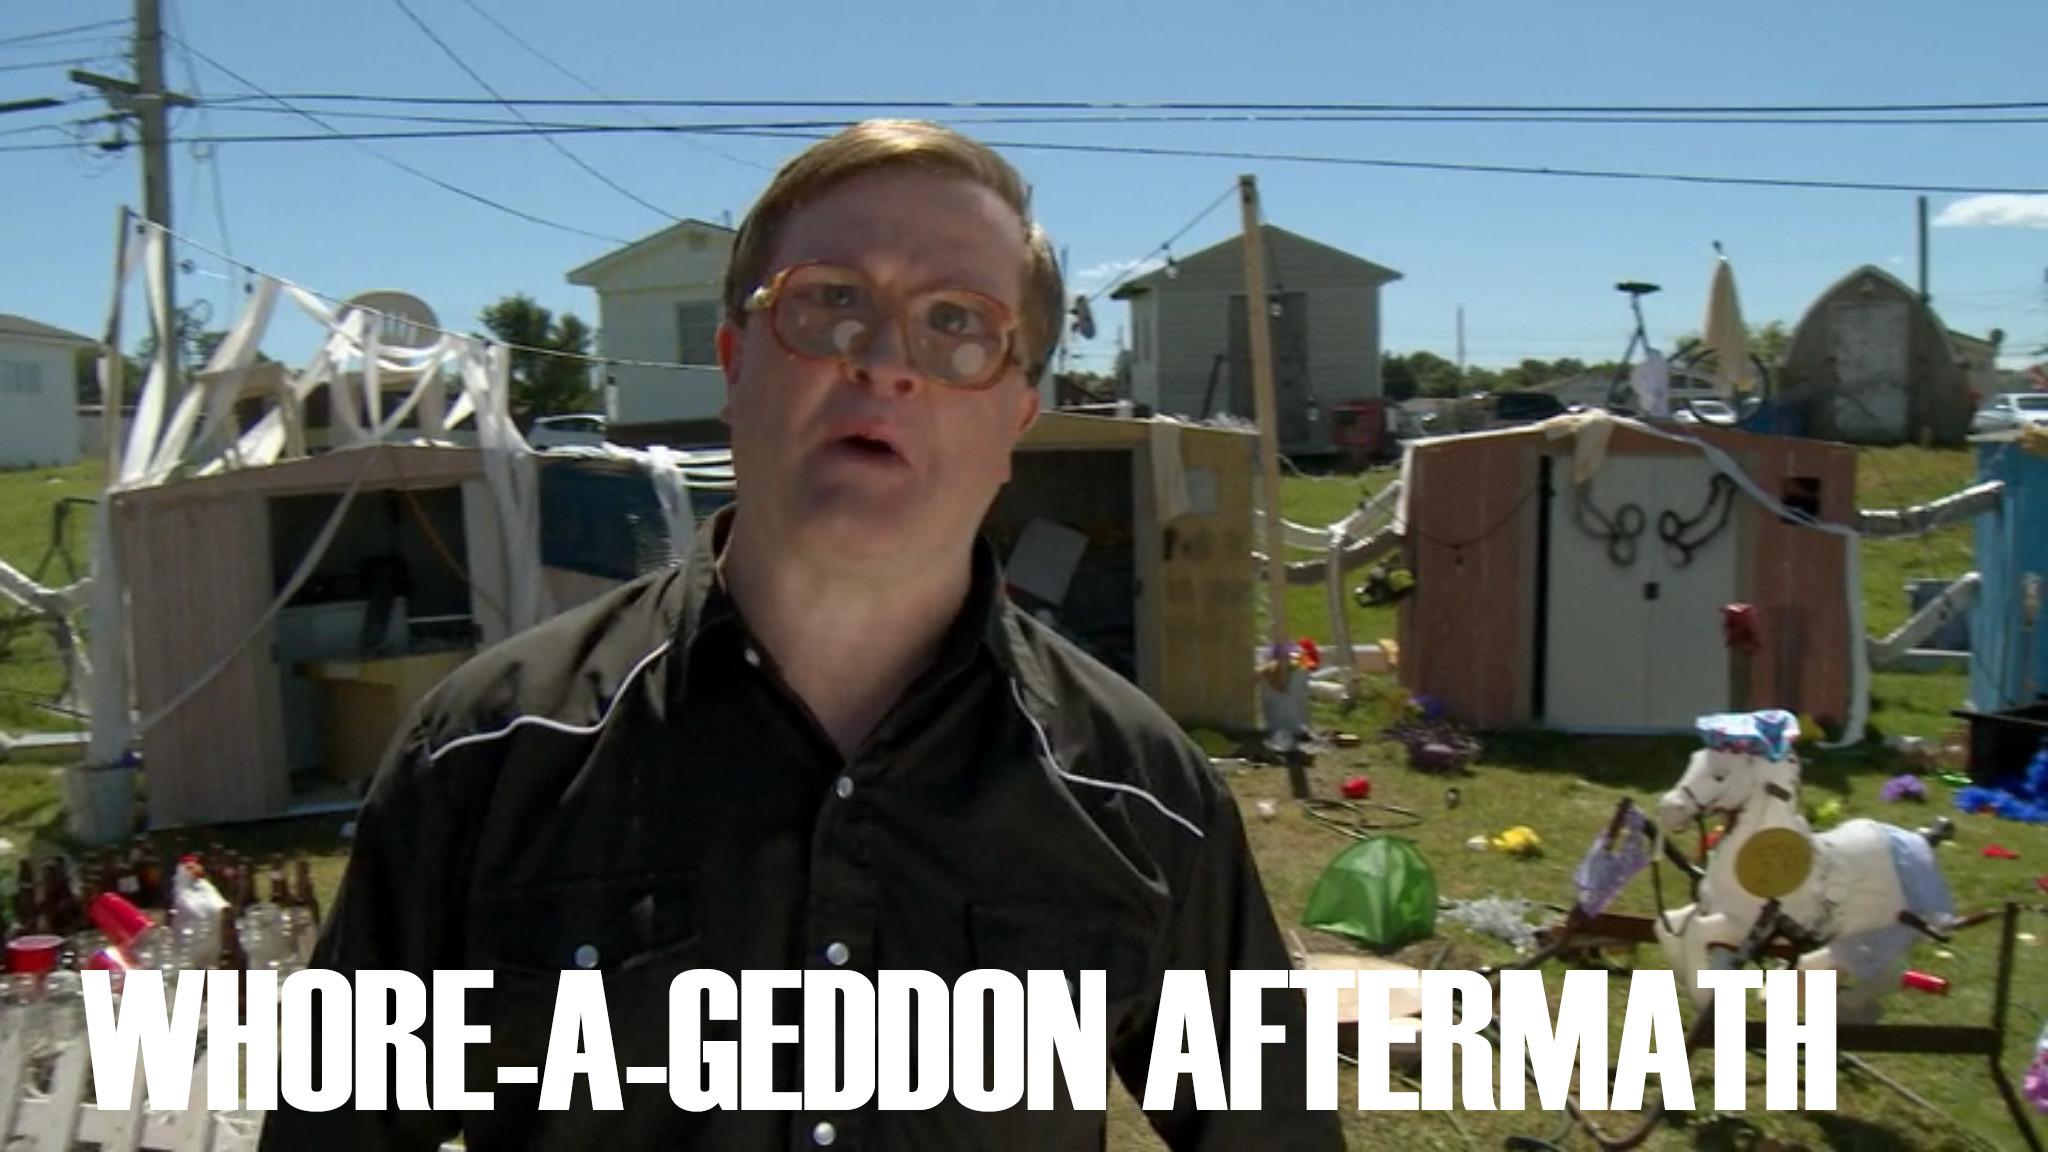 Trailer park boys · Whore-a-geddon Aftermath